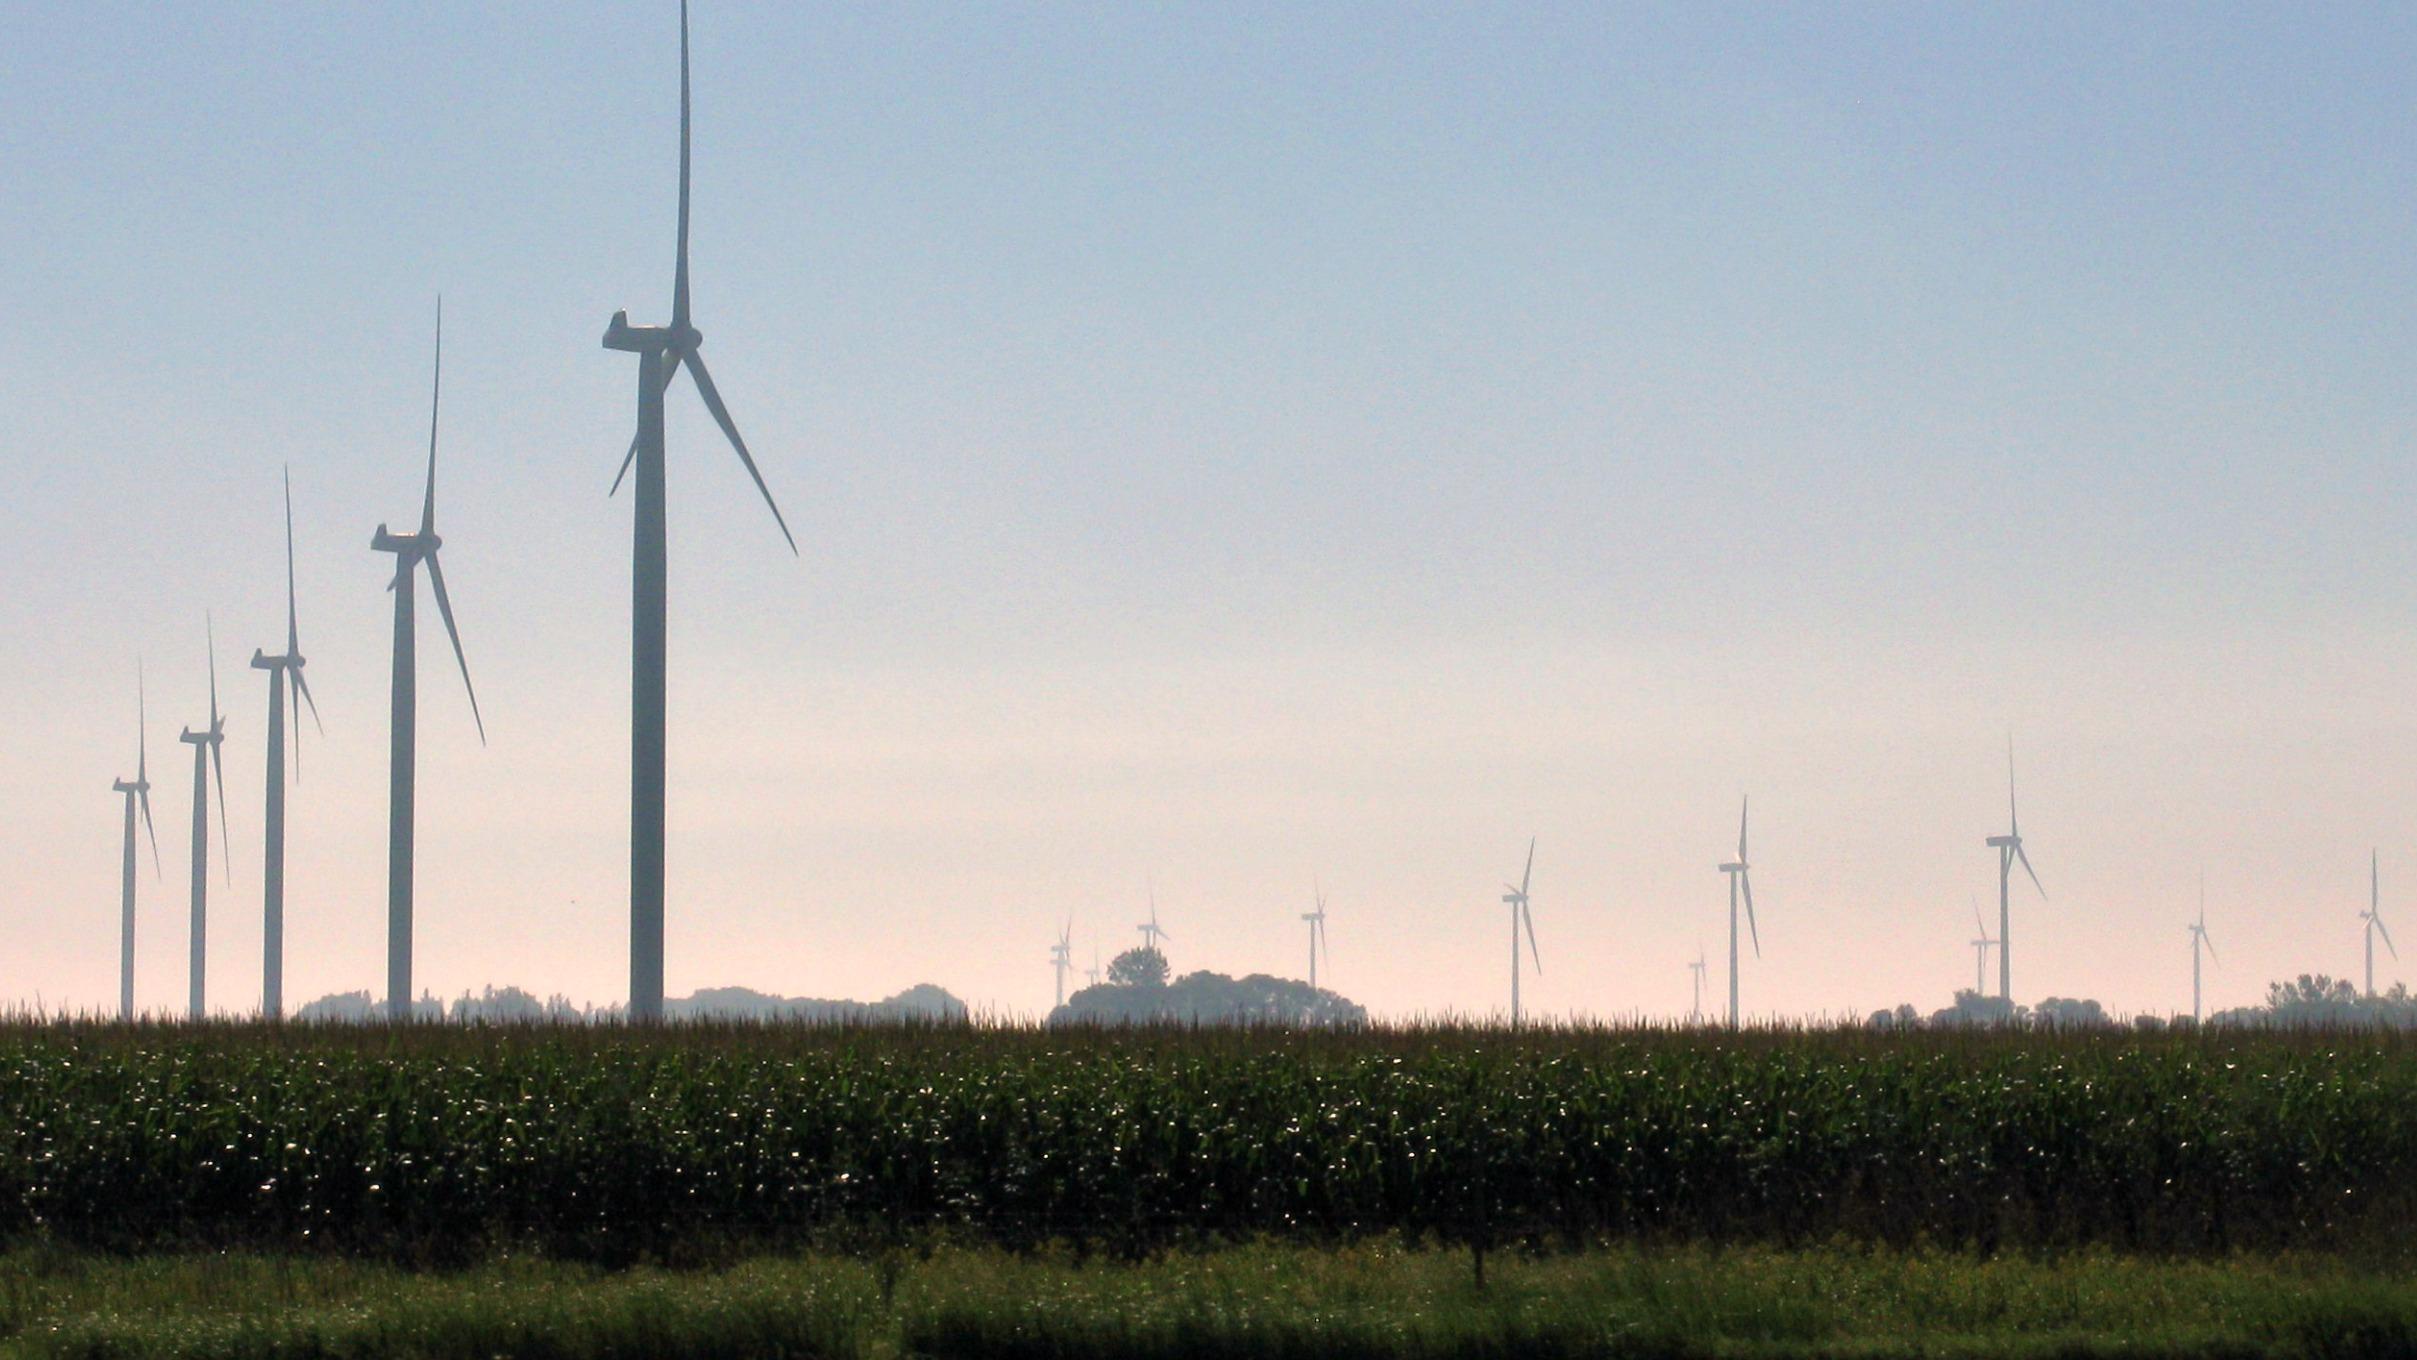 Wind turbines in South Dakota